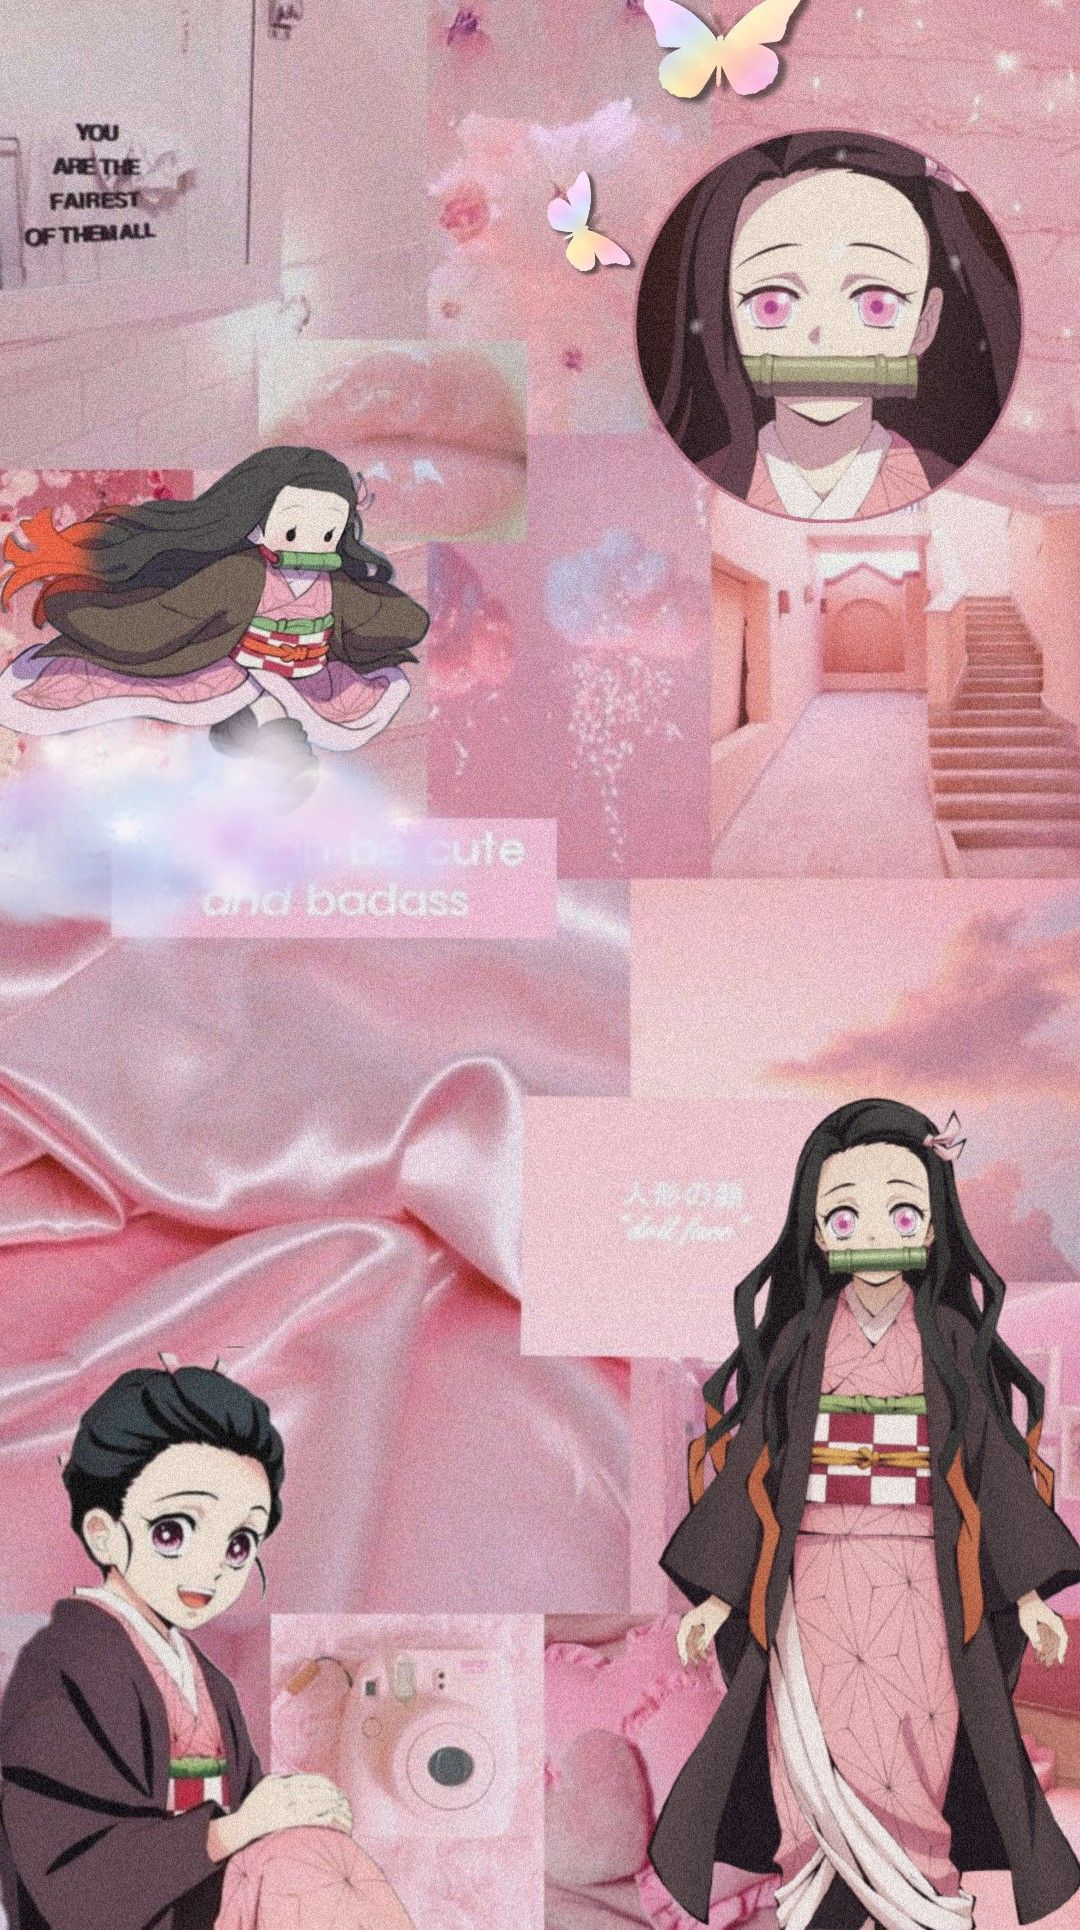 Cute Aesthetic Anime Wallpaper In 2020 Cute Anime Wallpaper